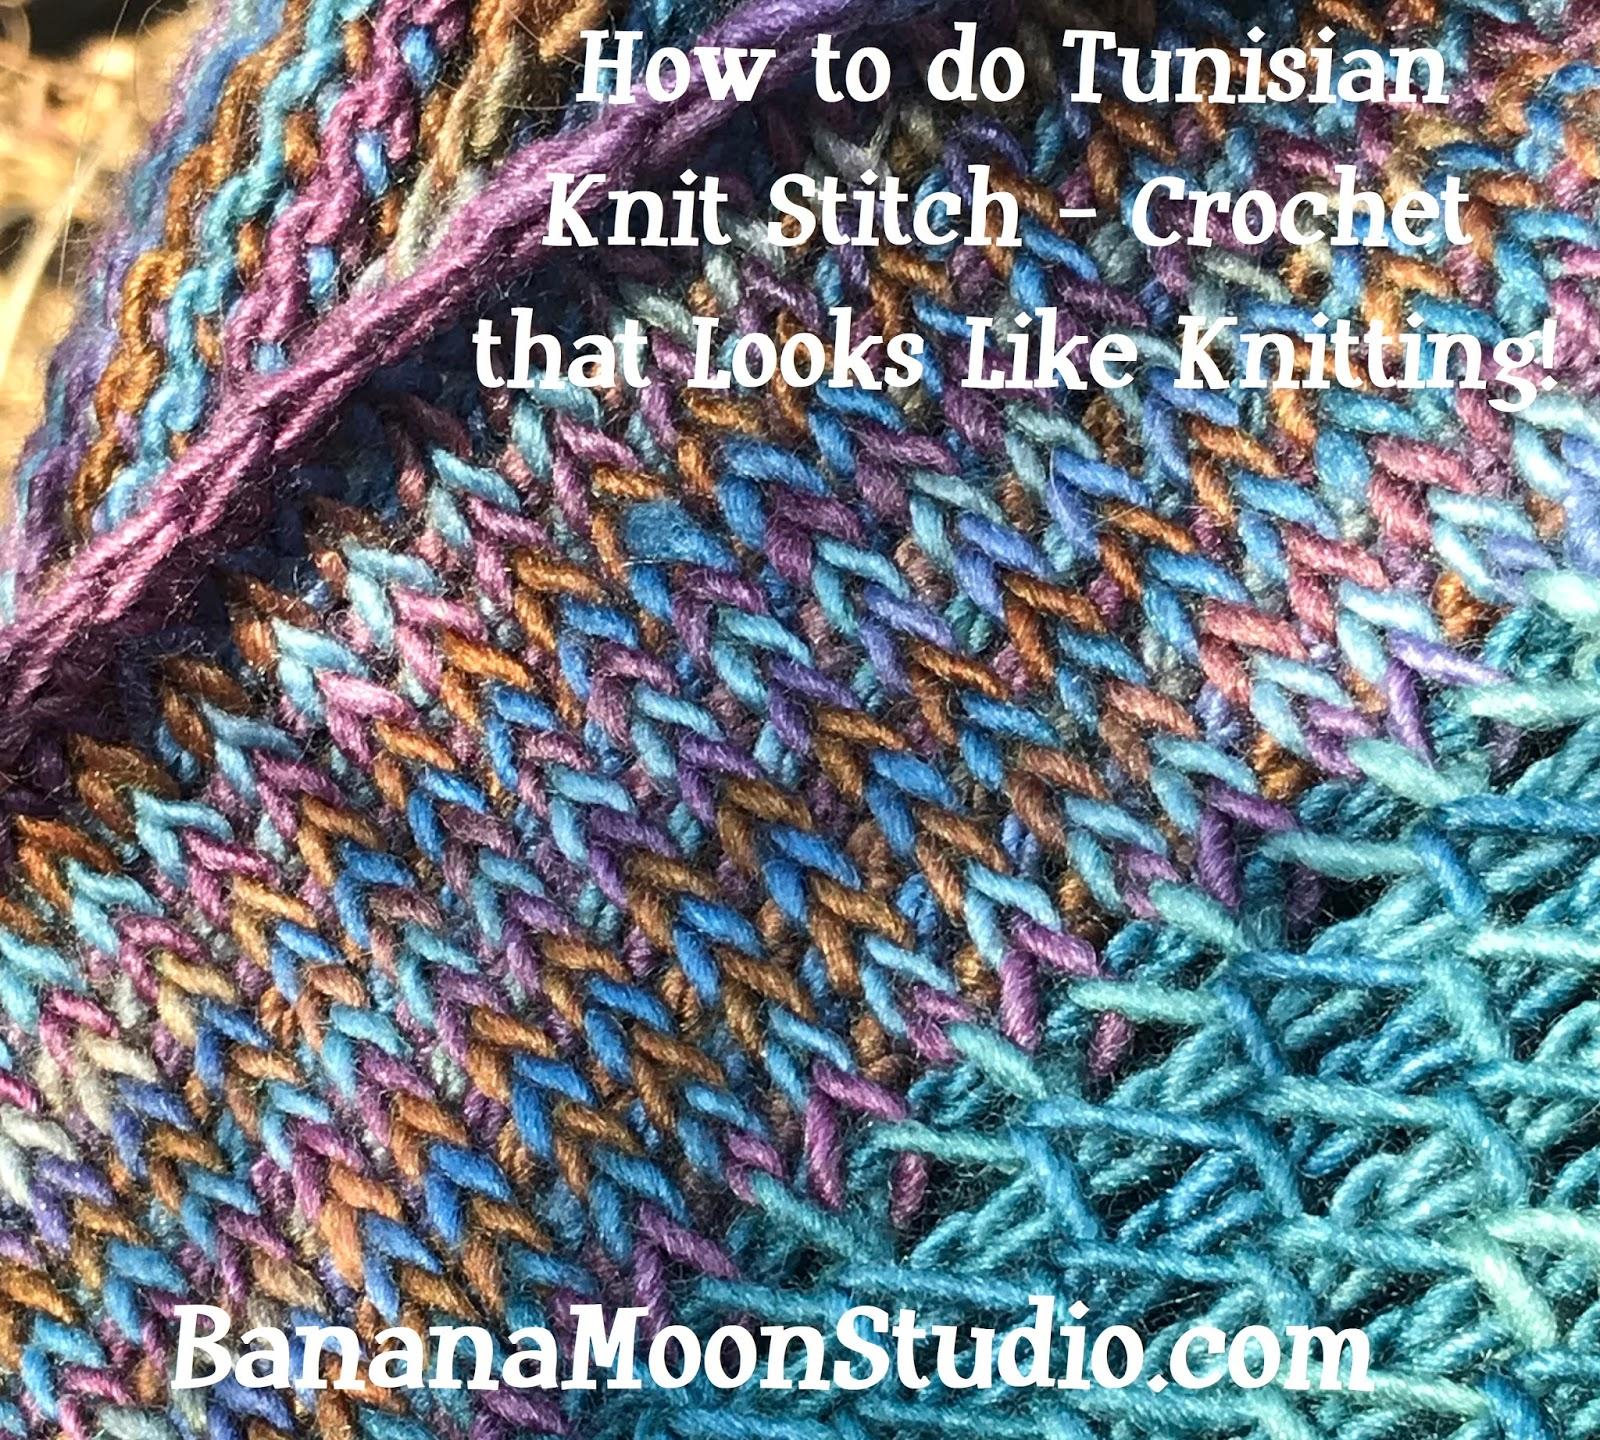 Banana Moon Studio : How to do Tunisian Knit Stitch - Crochet that ...